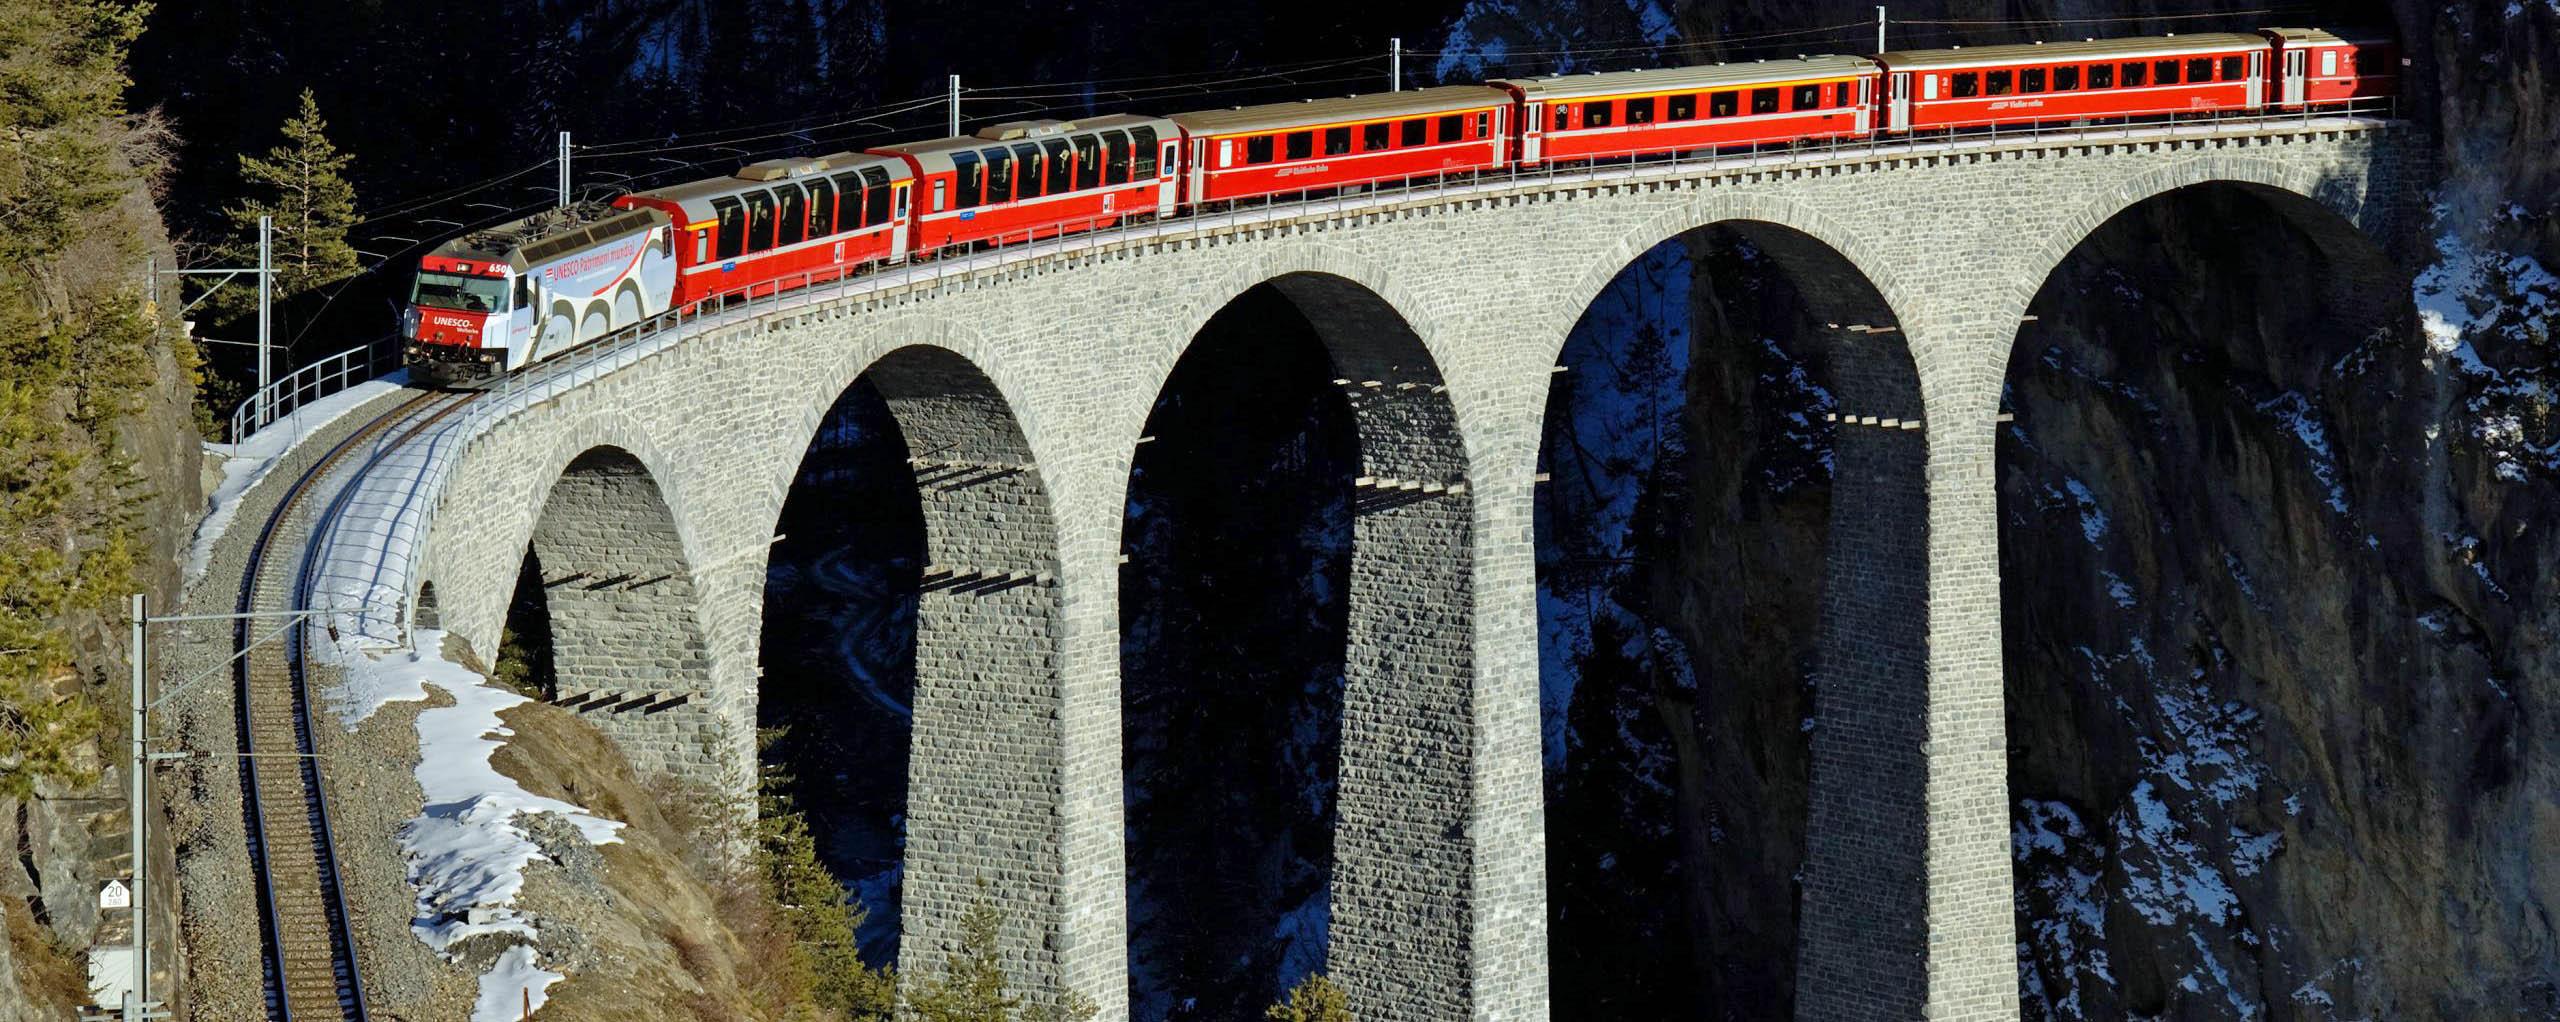 Eurail Austro Hungarian